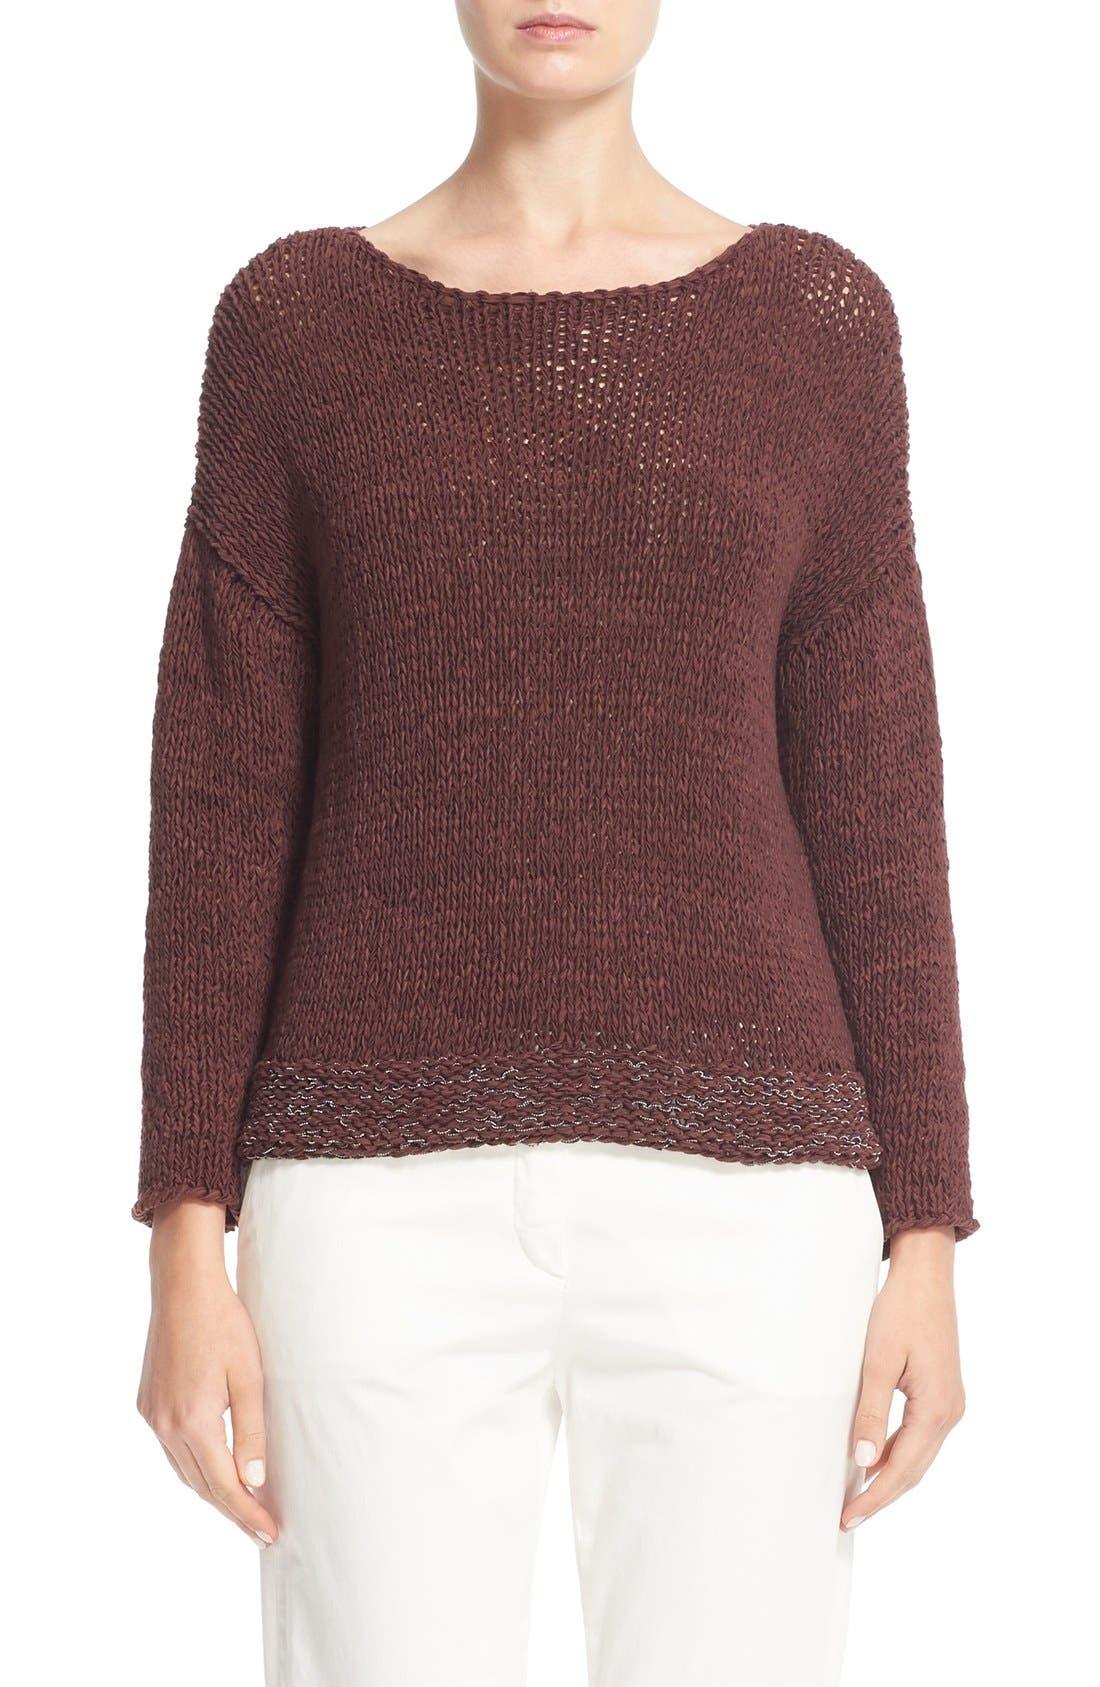 Mollini Trim Cotton Blend Sweater,                         Main,                         color, 601